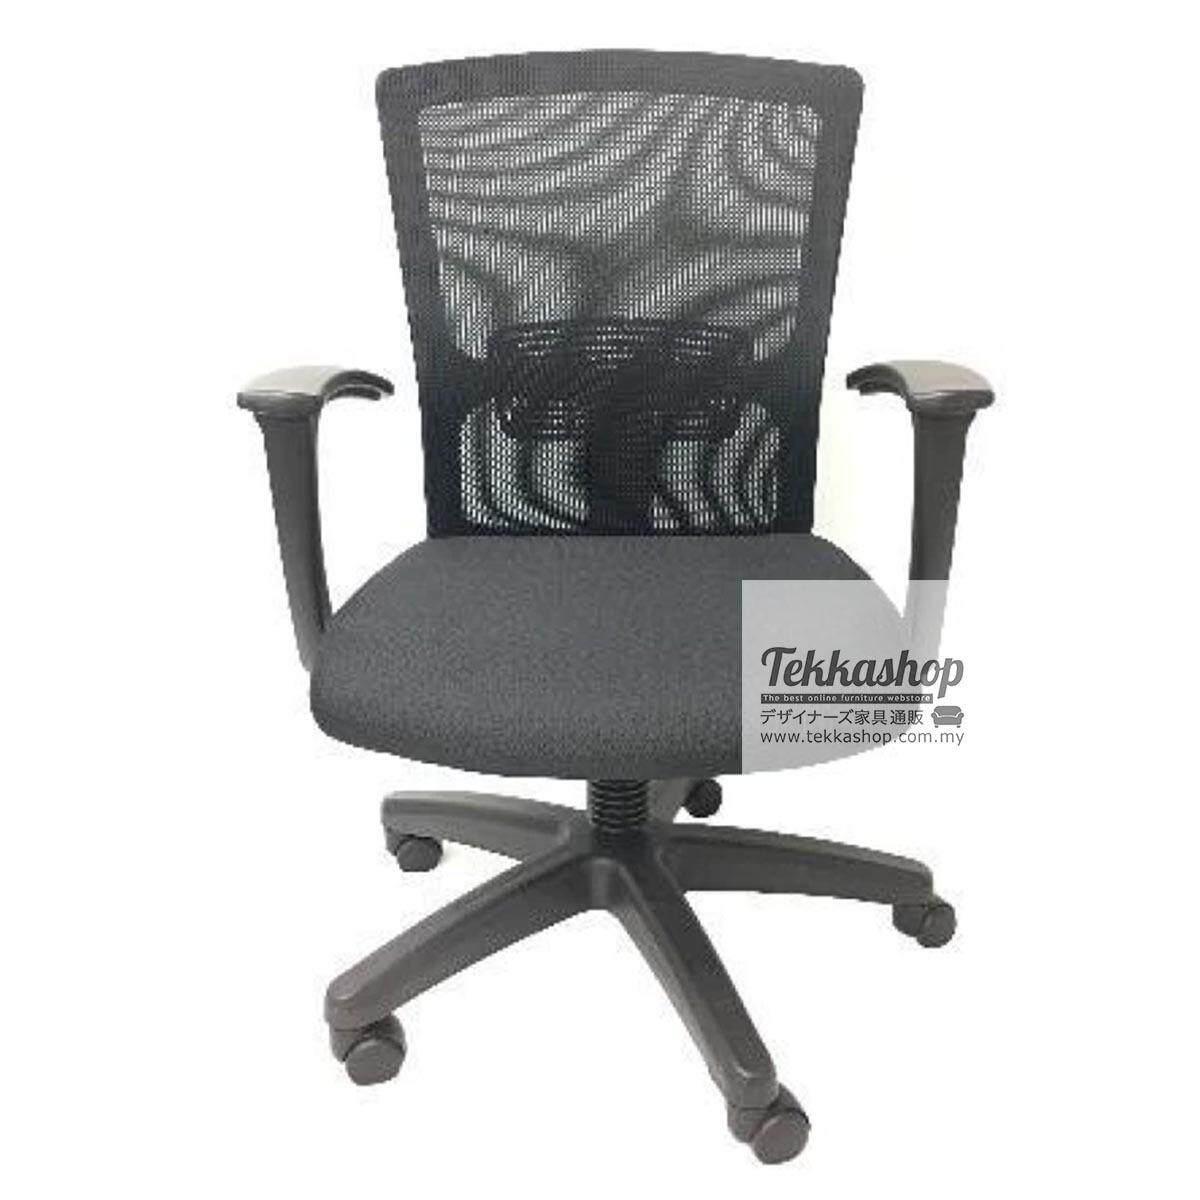 KIKO400 Contemporary Gaming Adjustable Office Swivel Chair (BLACK)